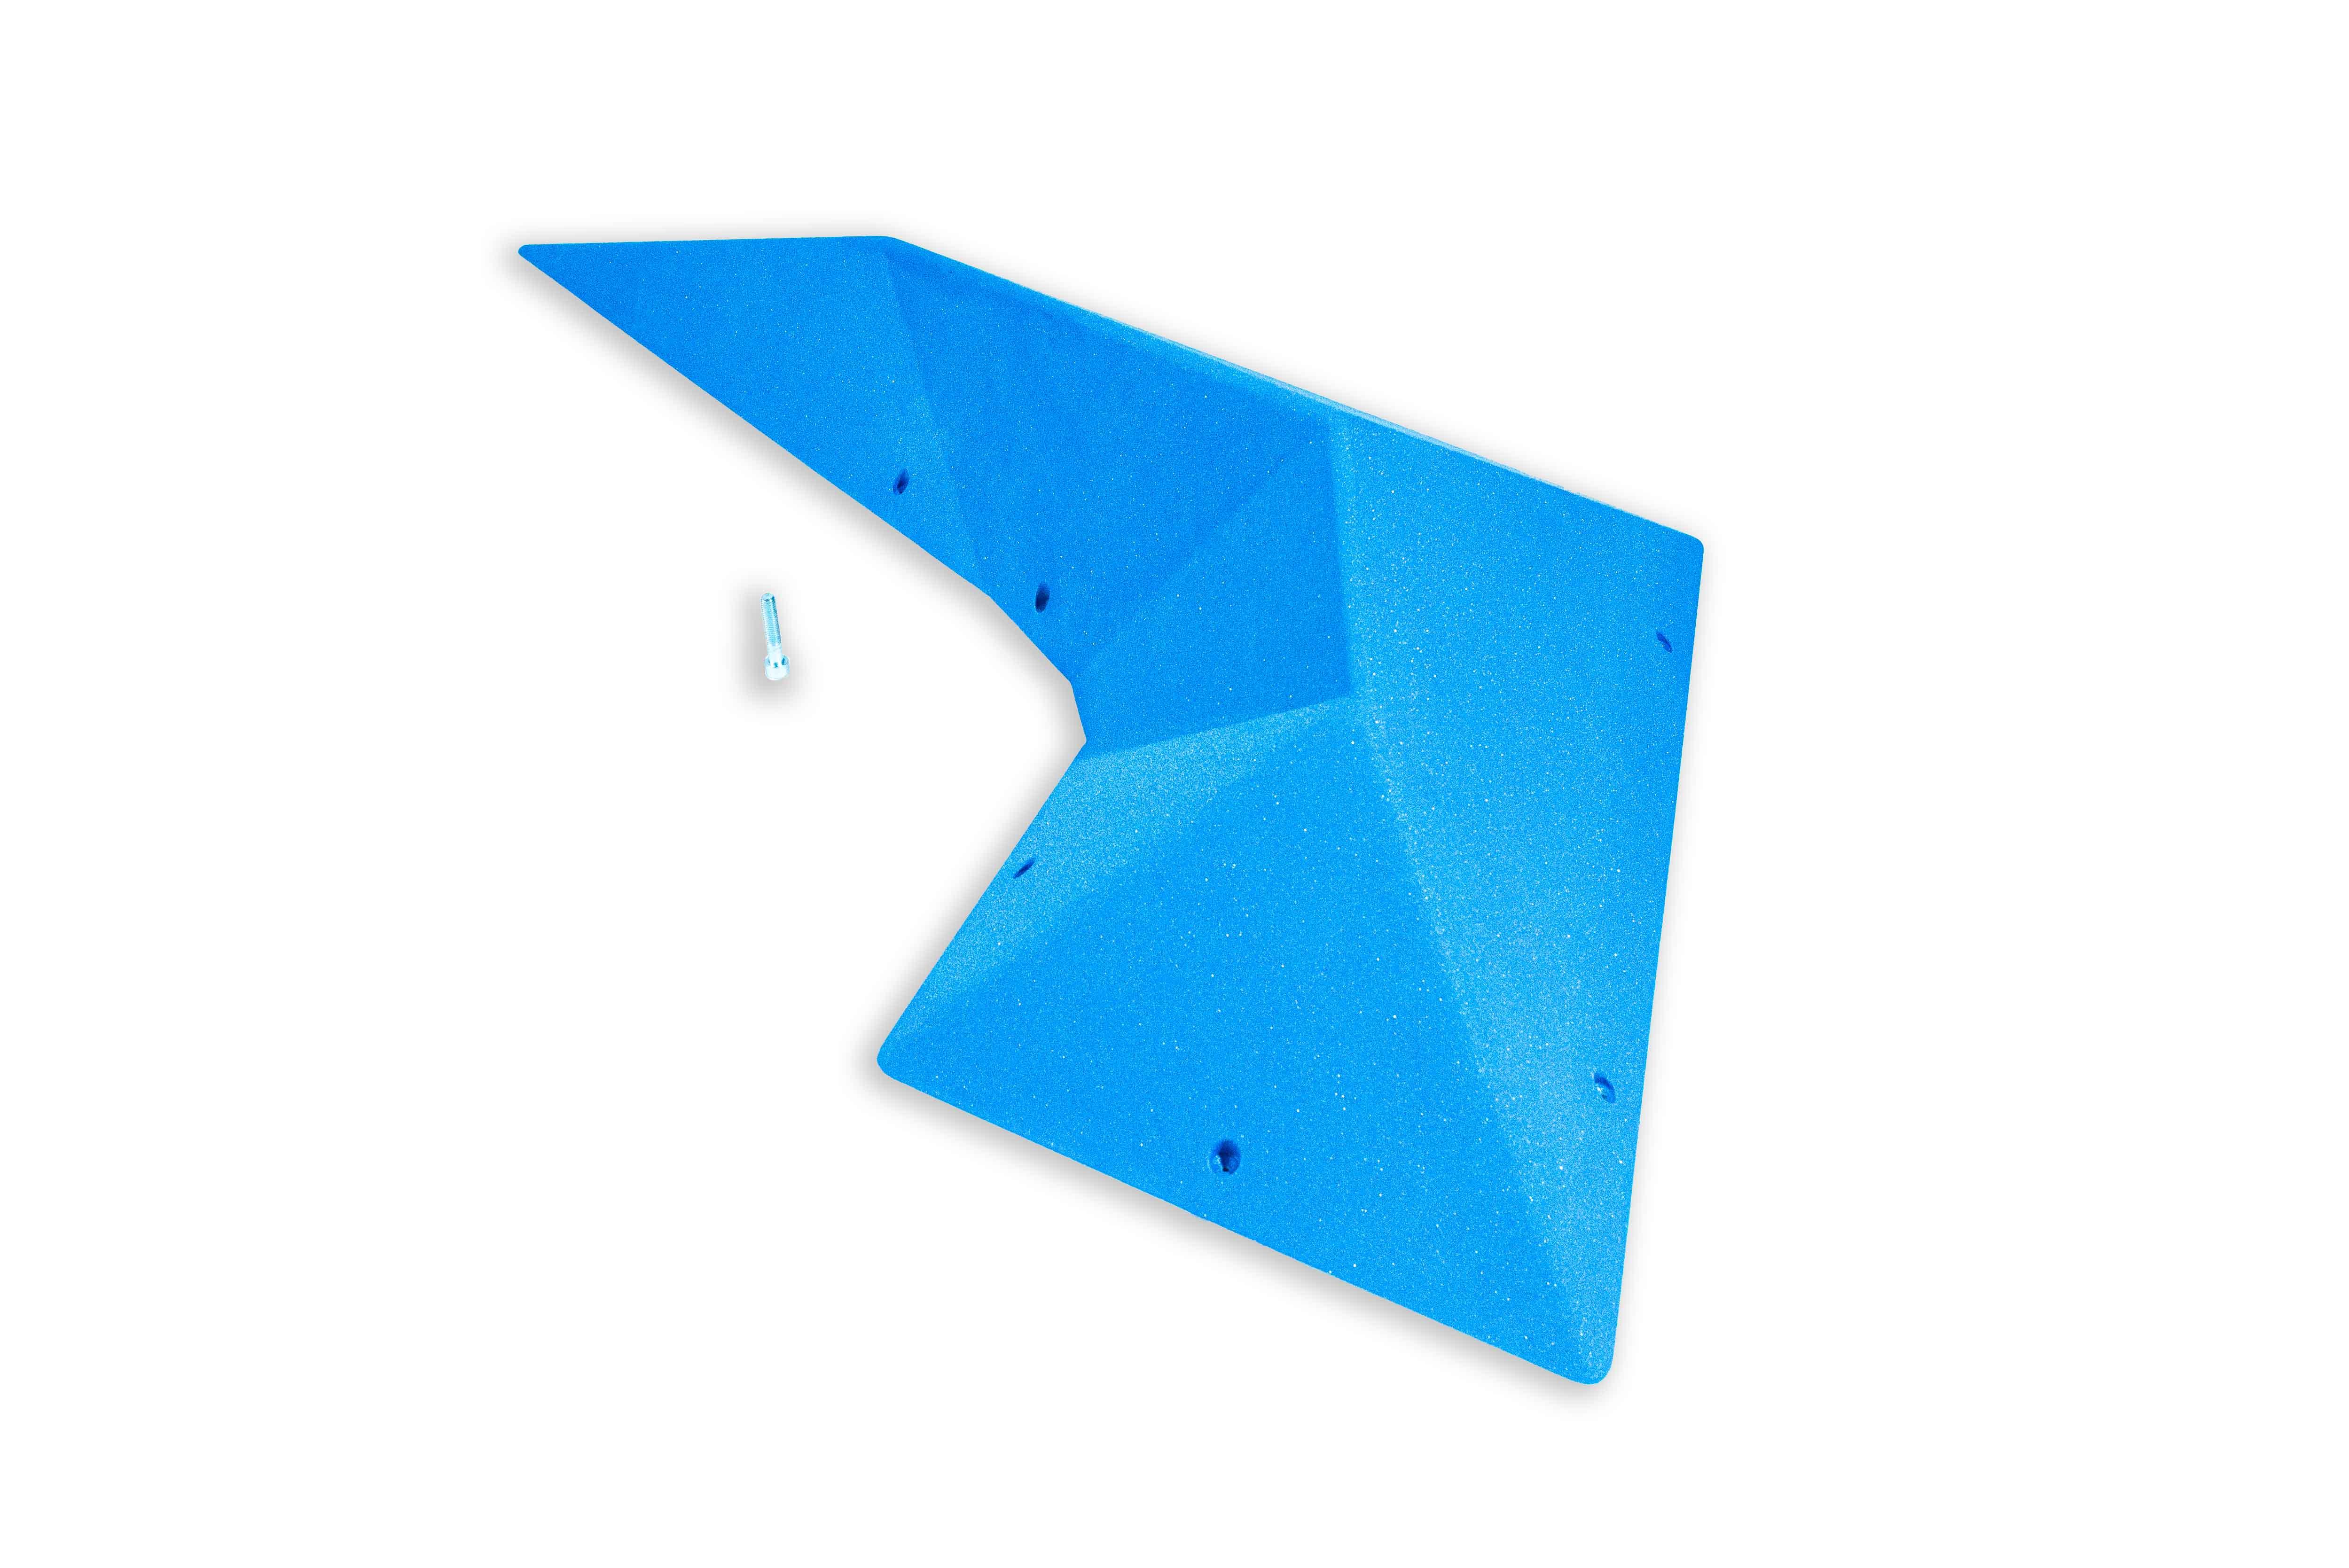 BluePill - Bad Wing 1500 L